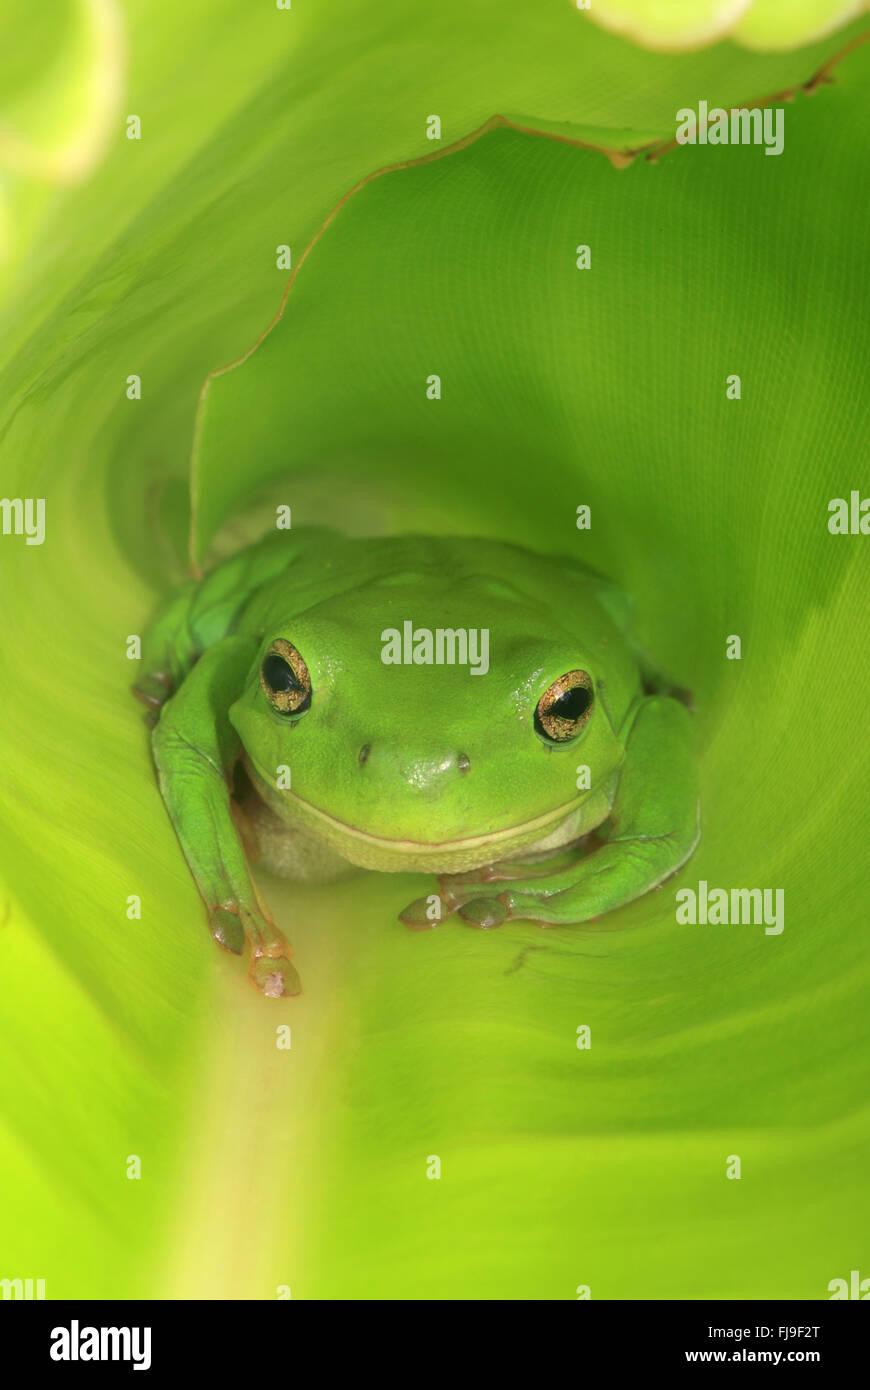 An Australian Green Tree Frog sitting inside a large broad green leaf. Stock Photo